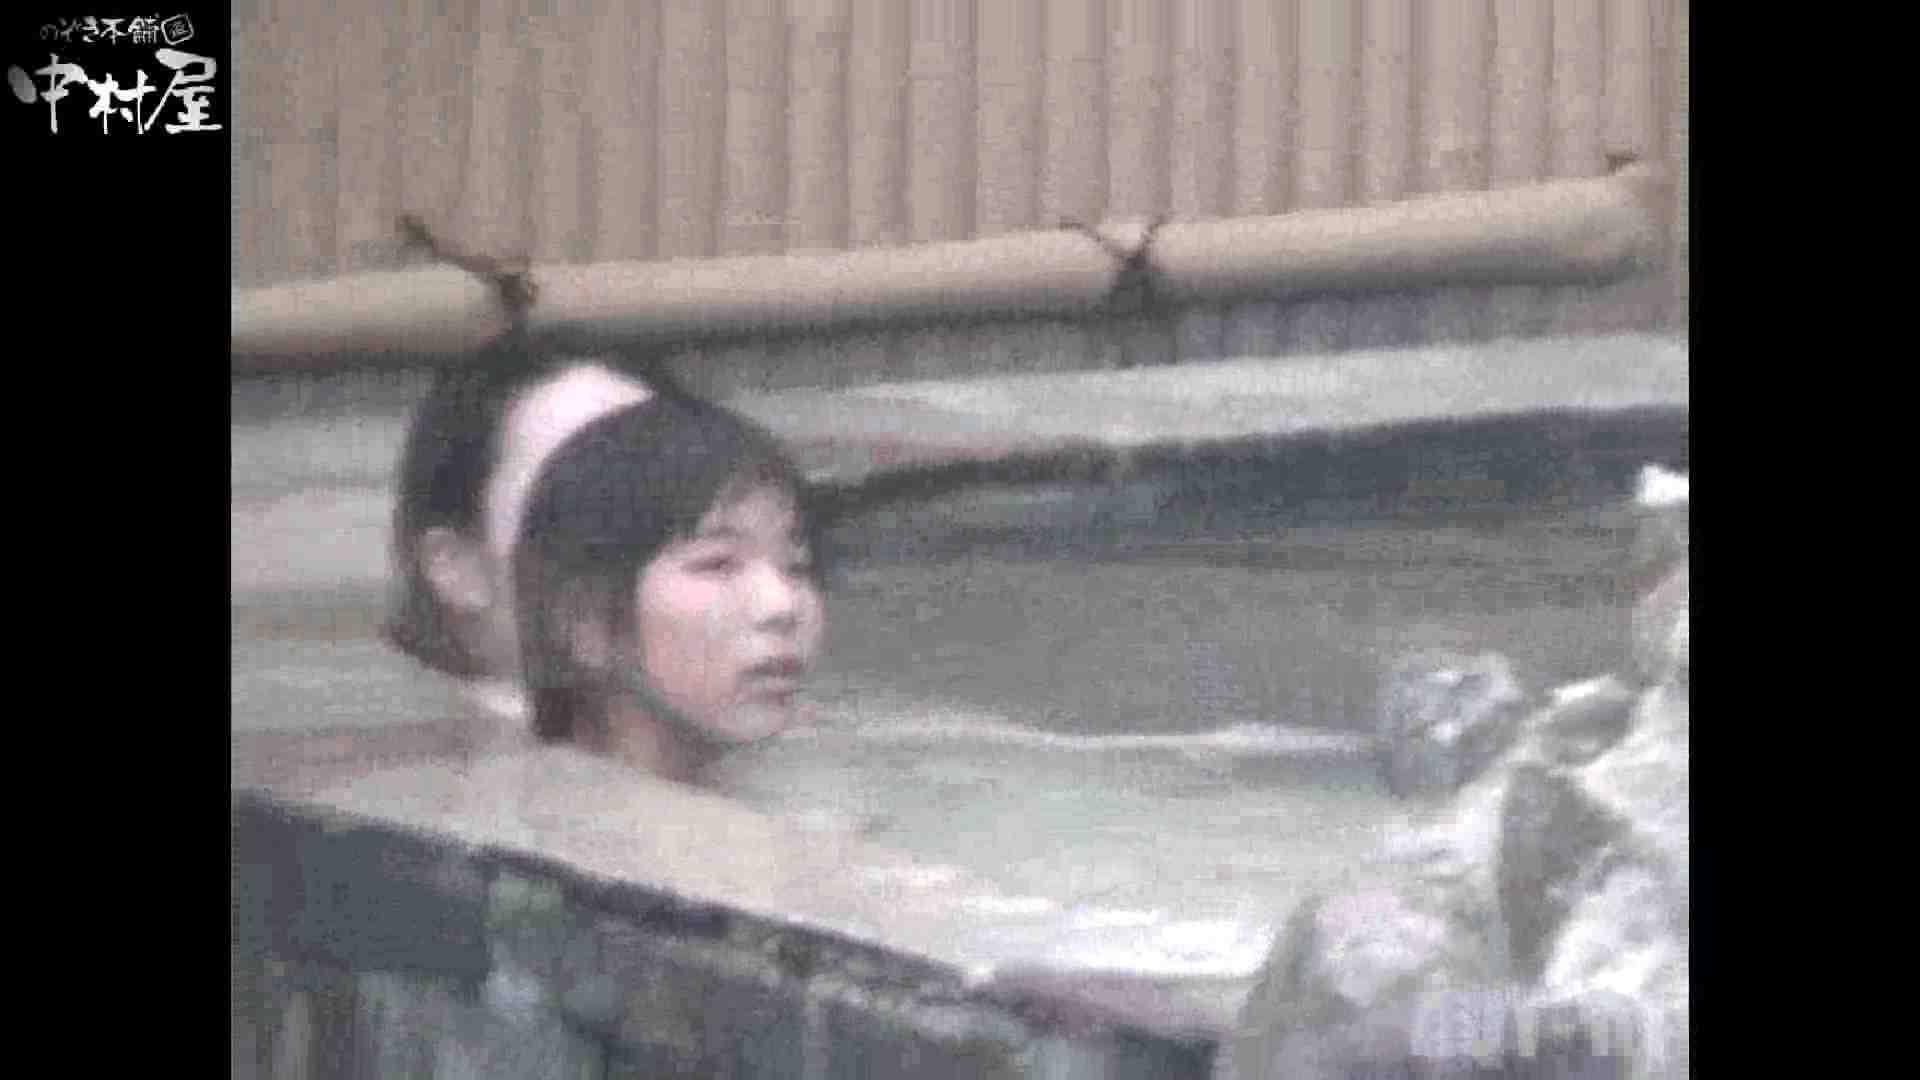 Aquaな露天風呂Vol.880潜入盗撮露天風呂十六判湯 其の七 OLハメ撮り  61Pix 24